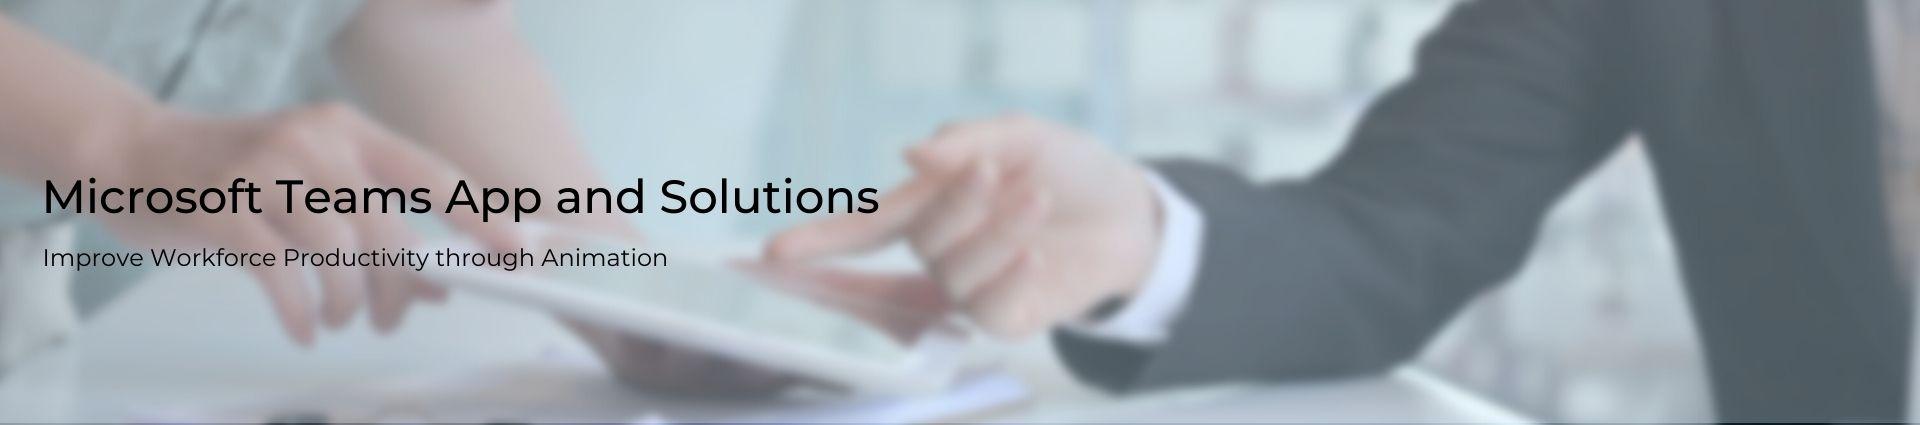 Xekera Microsoft Teams App and Solutions